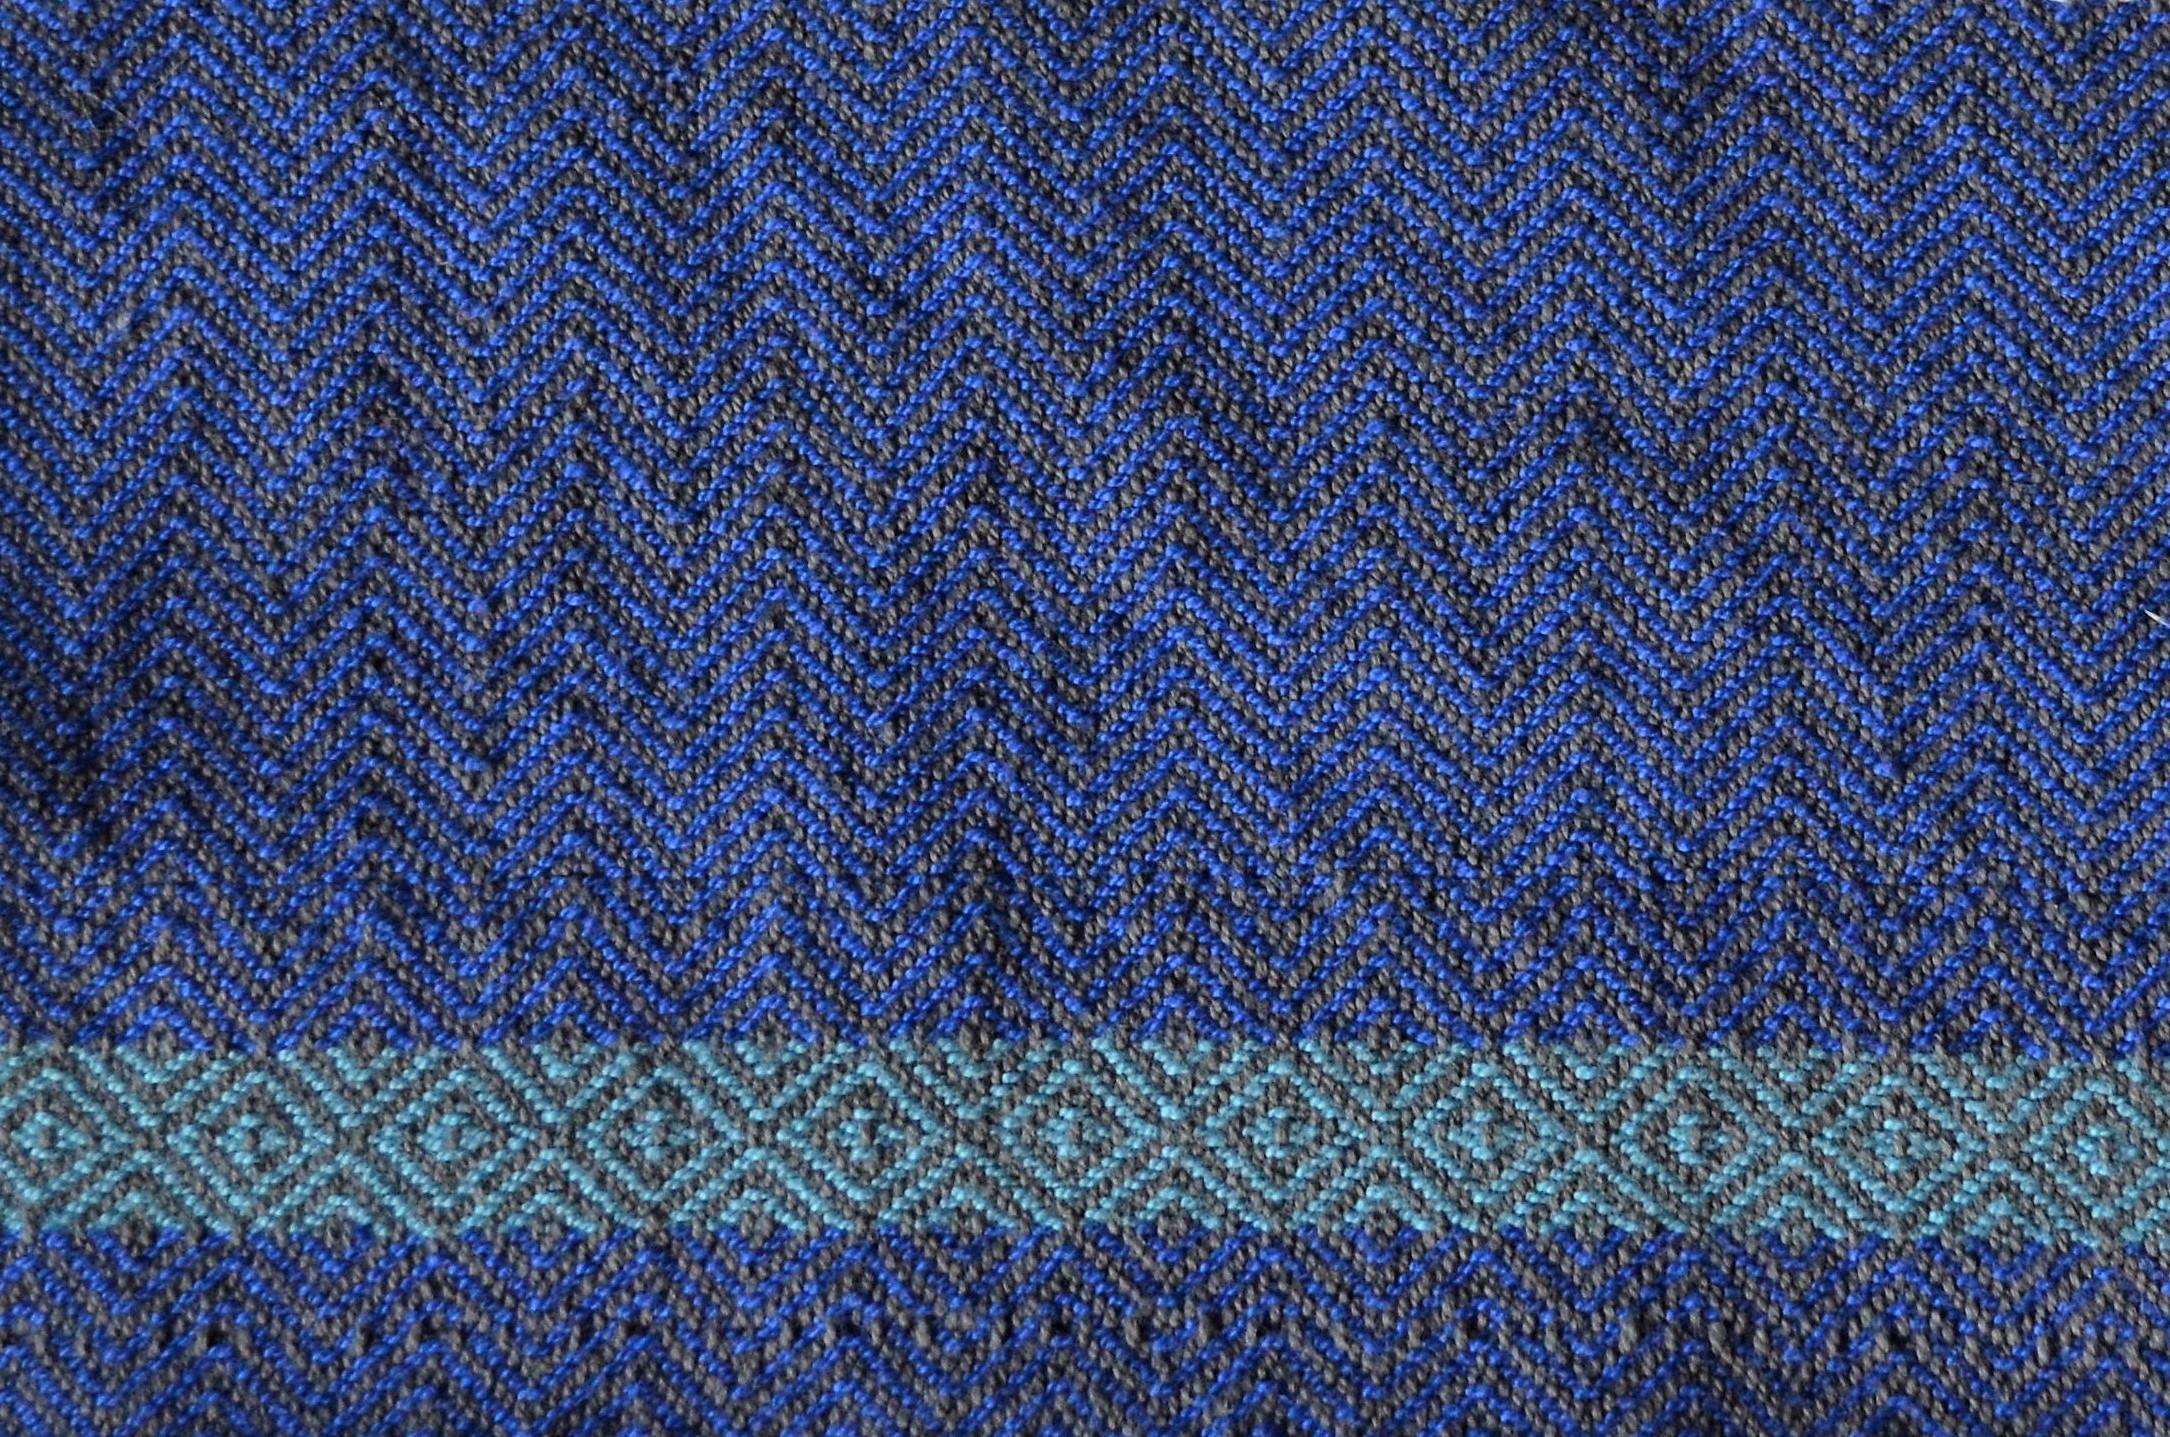 landis valley linen 4 shaft weaving pattern / warporweft.com